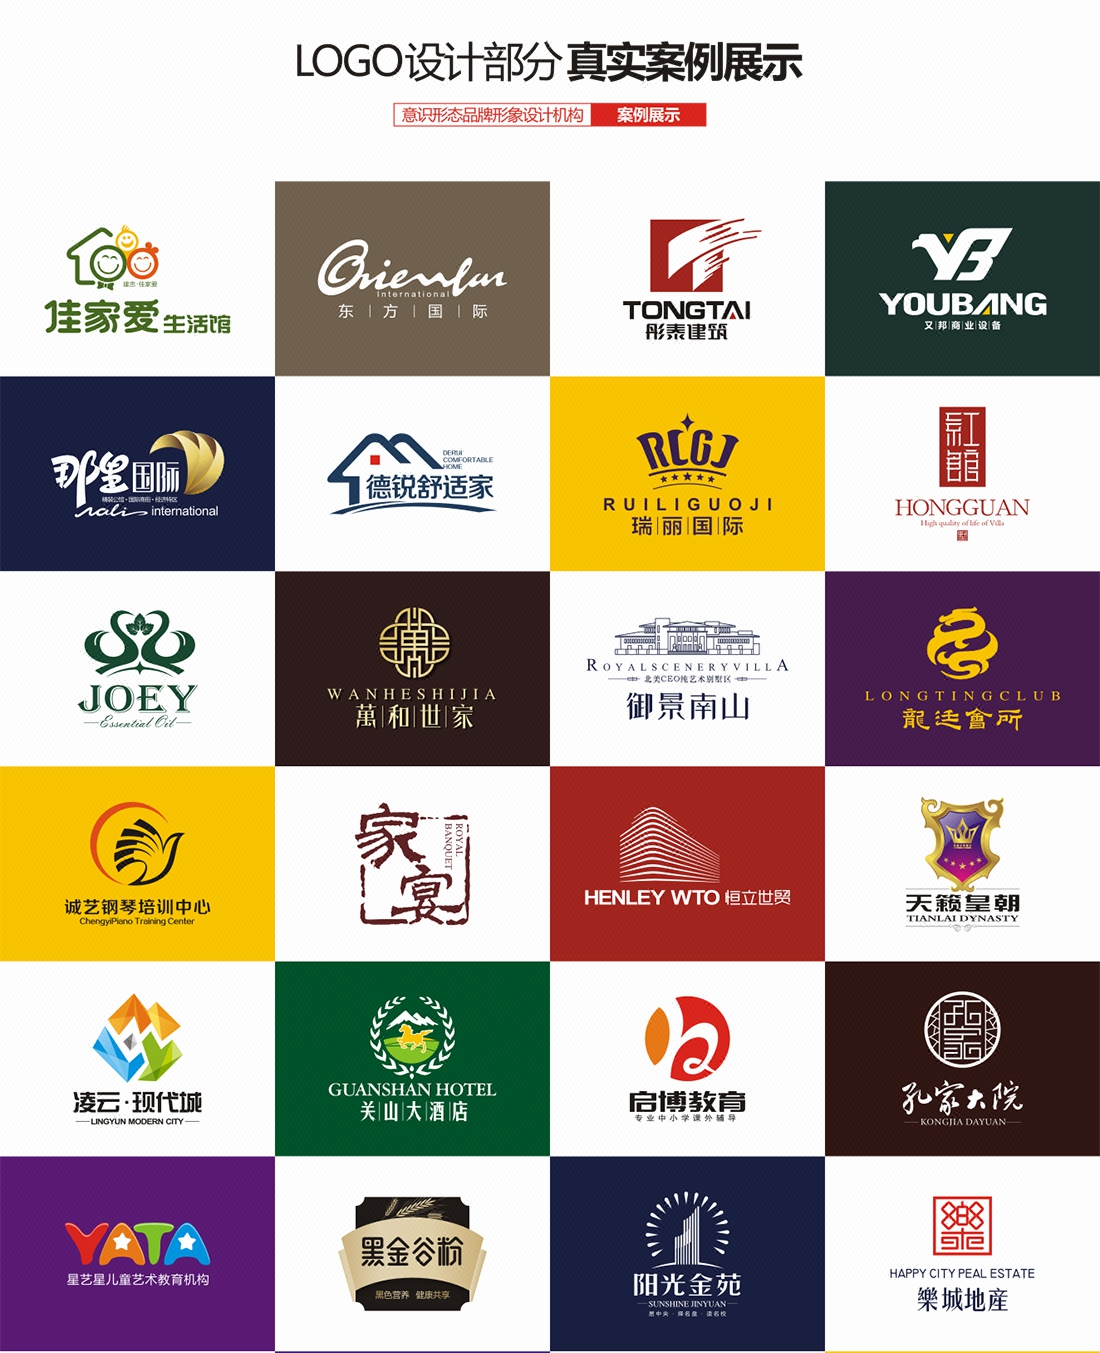 LOGO更新升级_公司企业logo设计平面餐饮门店LOGO图形标志品牌商标设计4